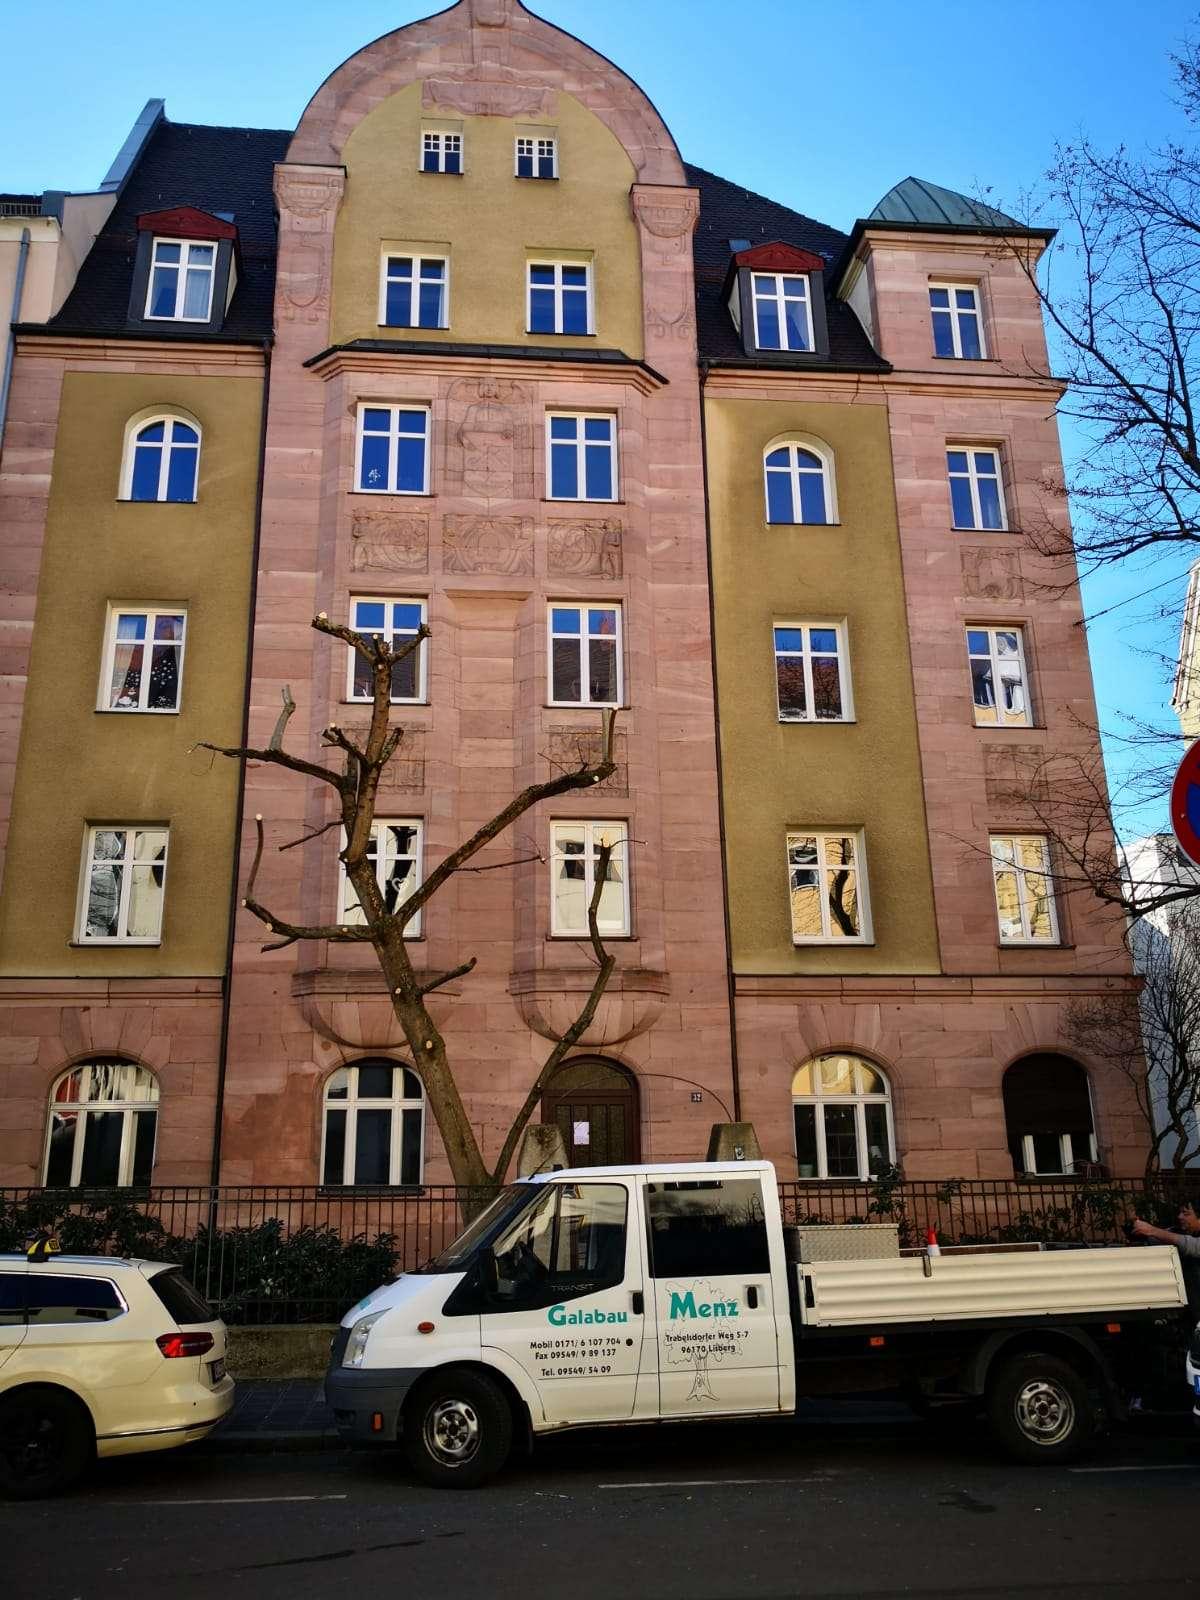 Komplettsanierung: Top gelegene ruhige 3,5 Zi-Whg mit Gartenanteil - Jugendstil Denkmal in Galgenhof (Nürnberg)